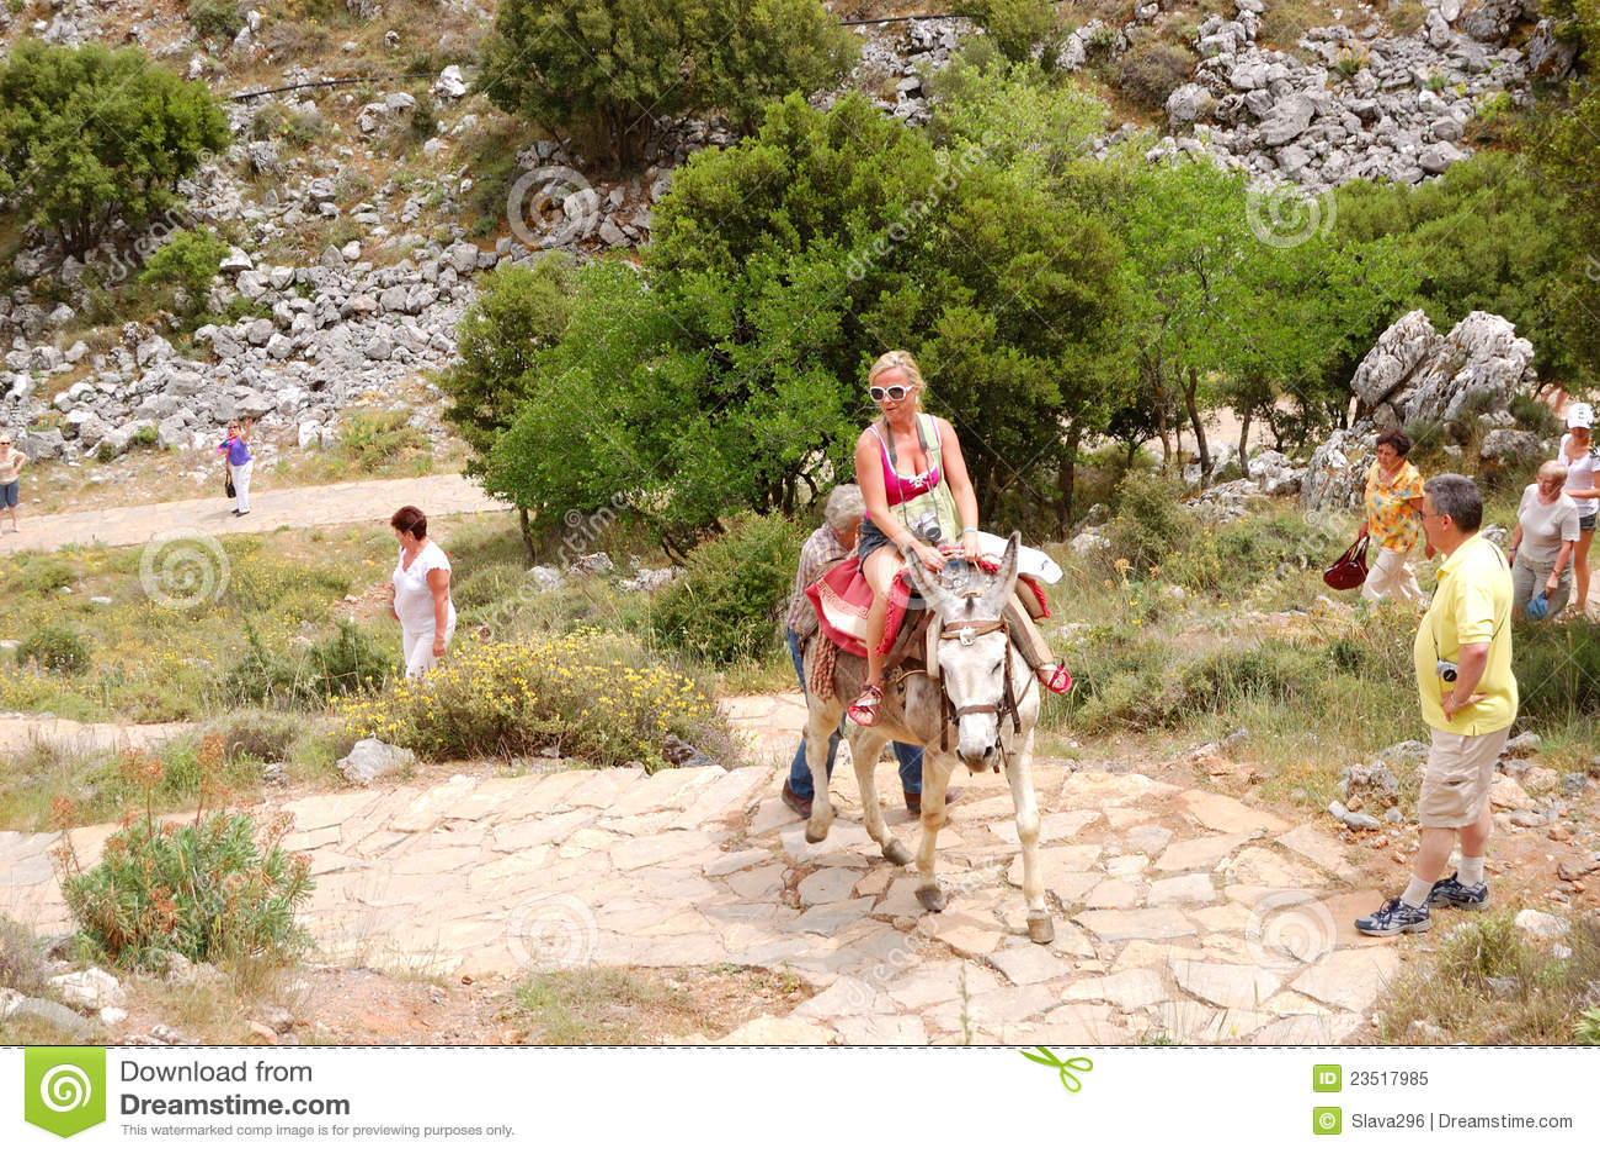 The female tourist on a donkey